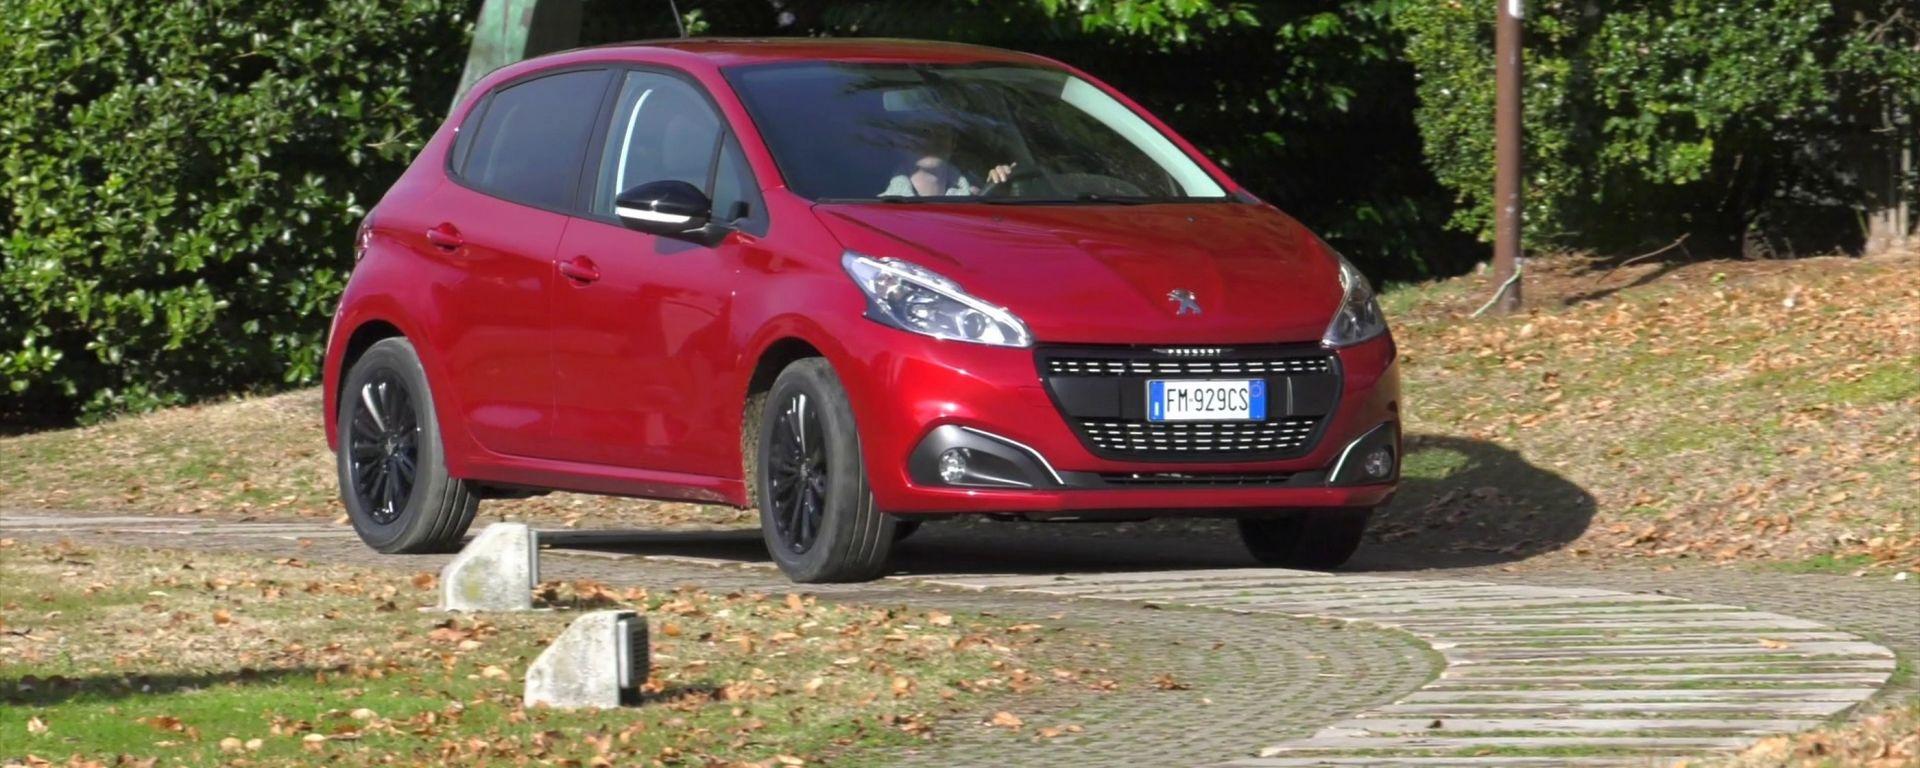 Peugeot 208 Black Line: 1.200 modi per sorprendere [VIDEO]